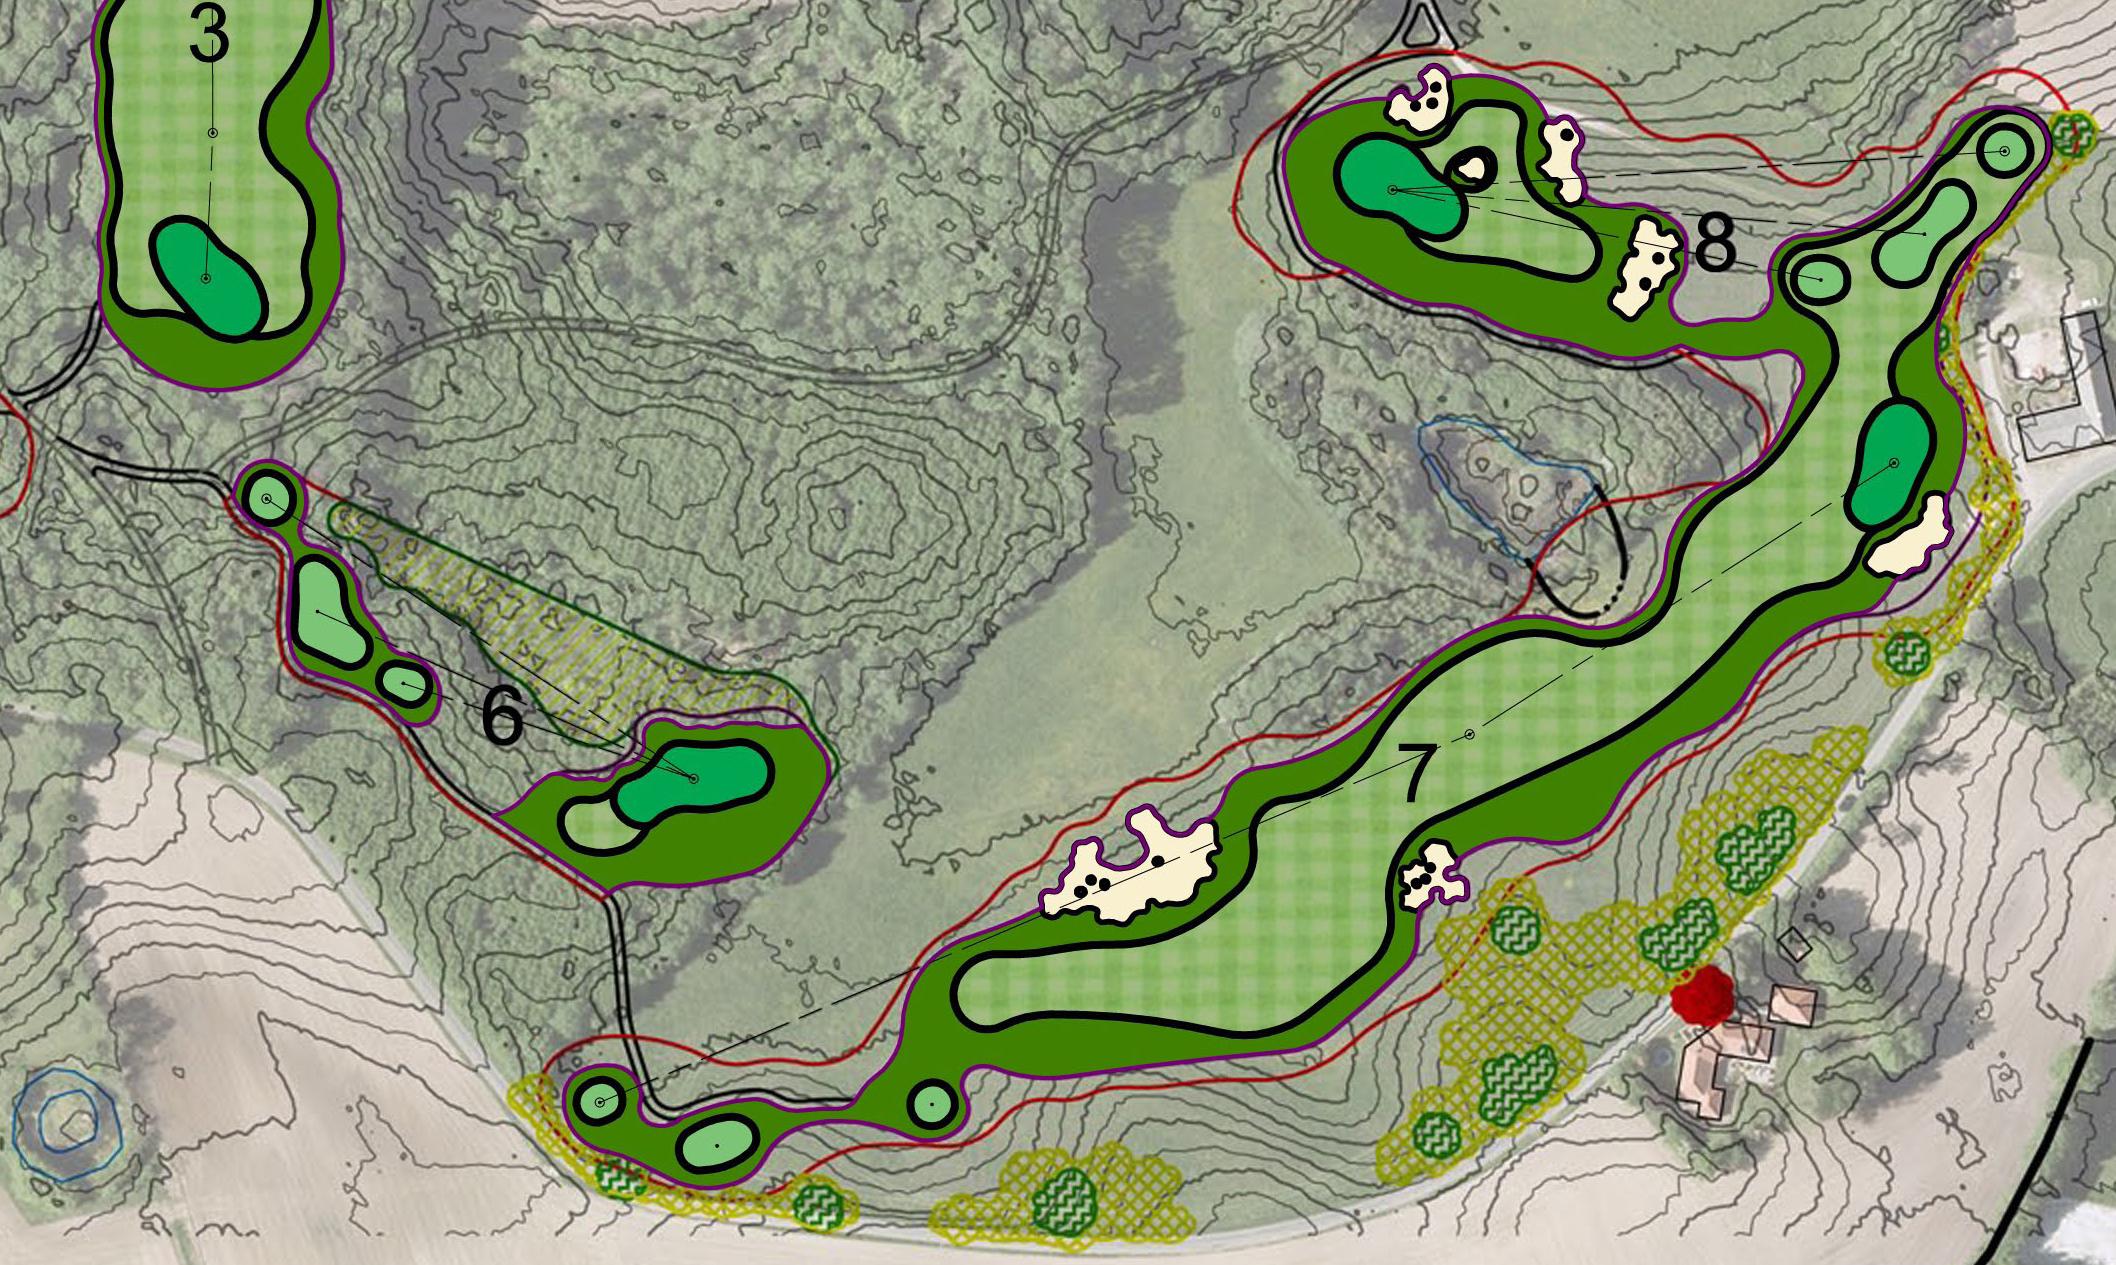 02_golf course final masterplan 2000sc w aerial.jpg